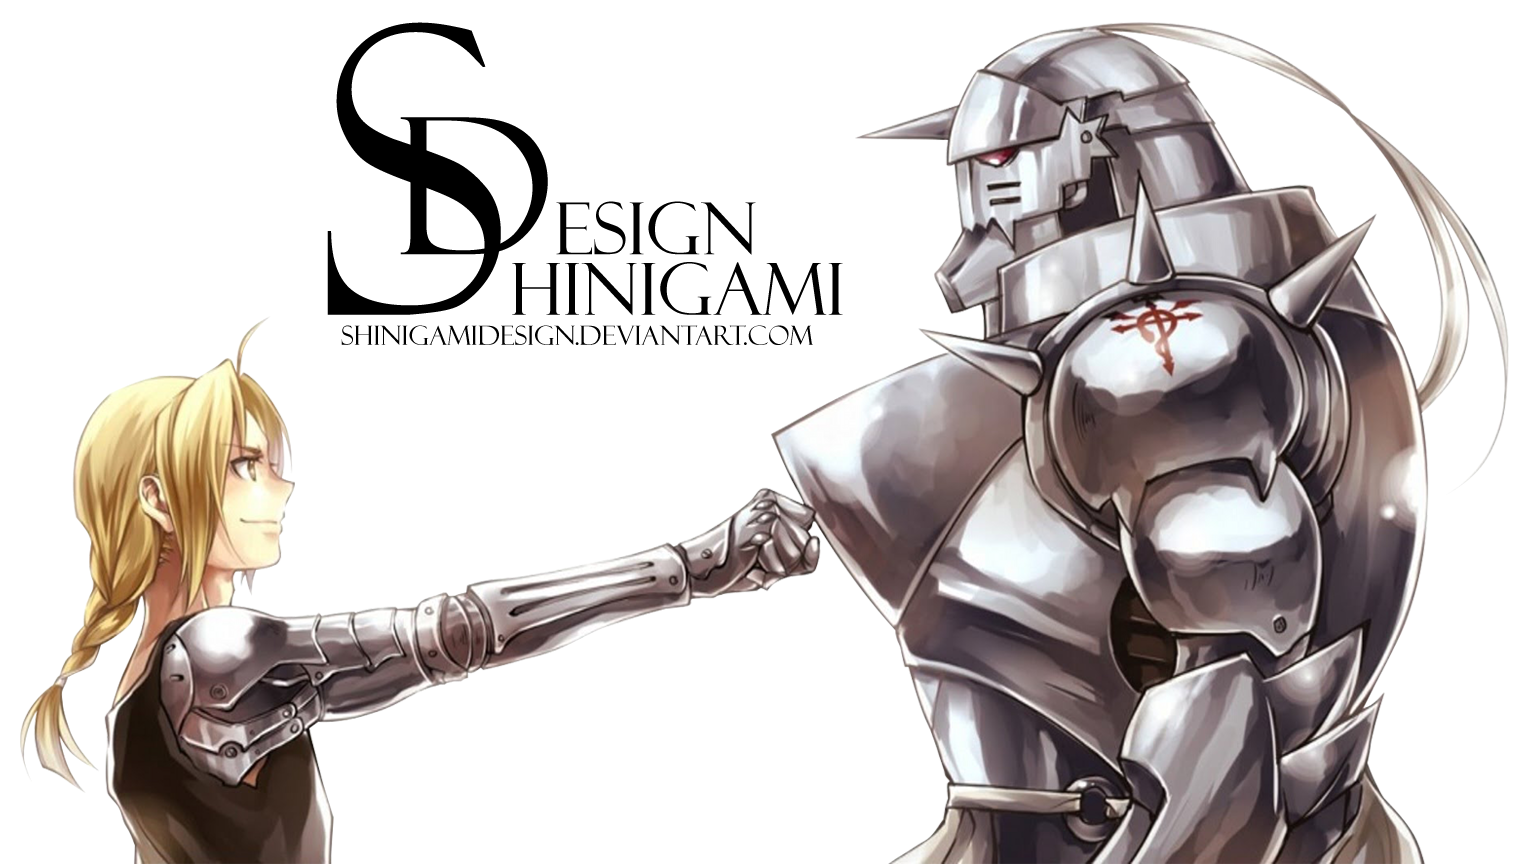 Edward and Alphonse - Render